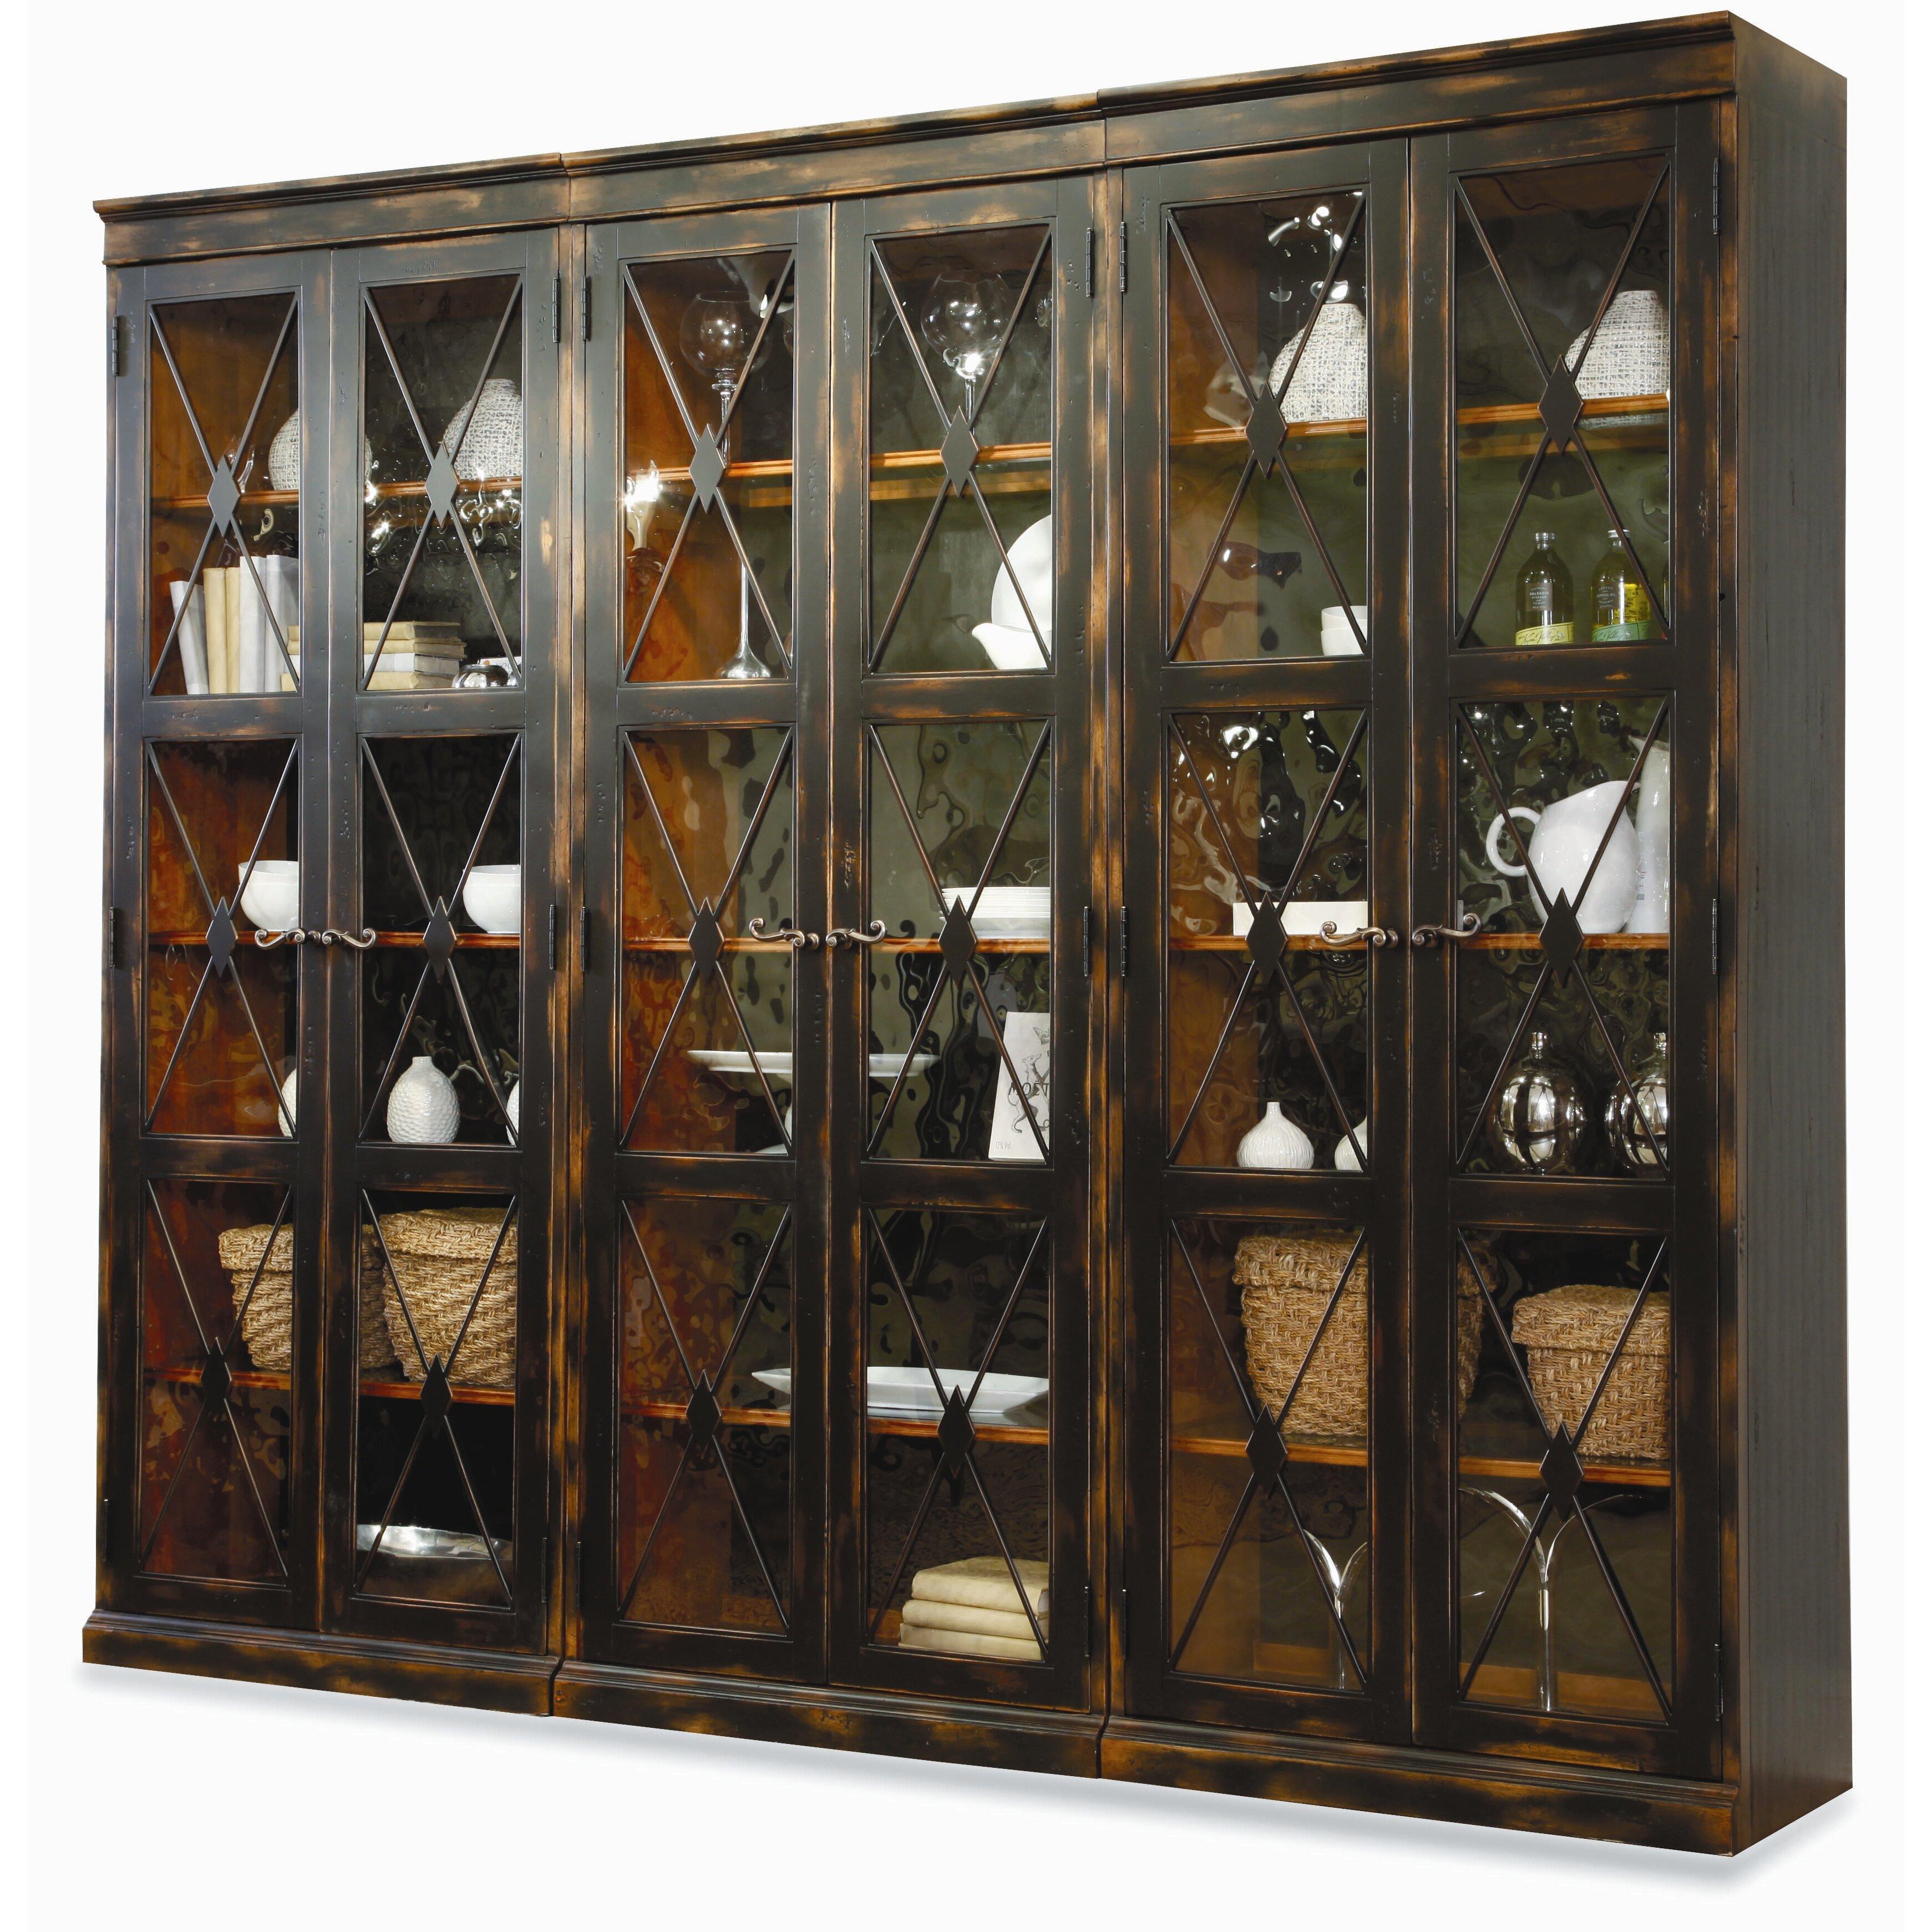 Hooker Furniture Sanctuary Curio Cabinet & Reviews